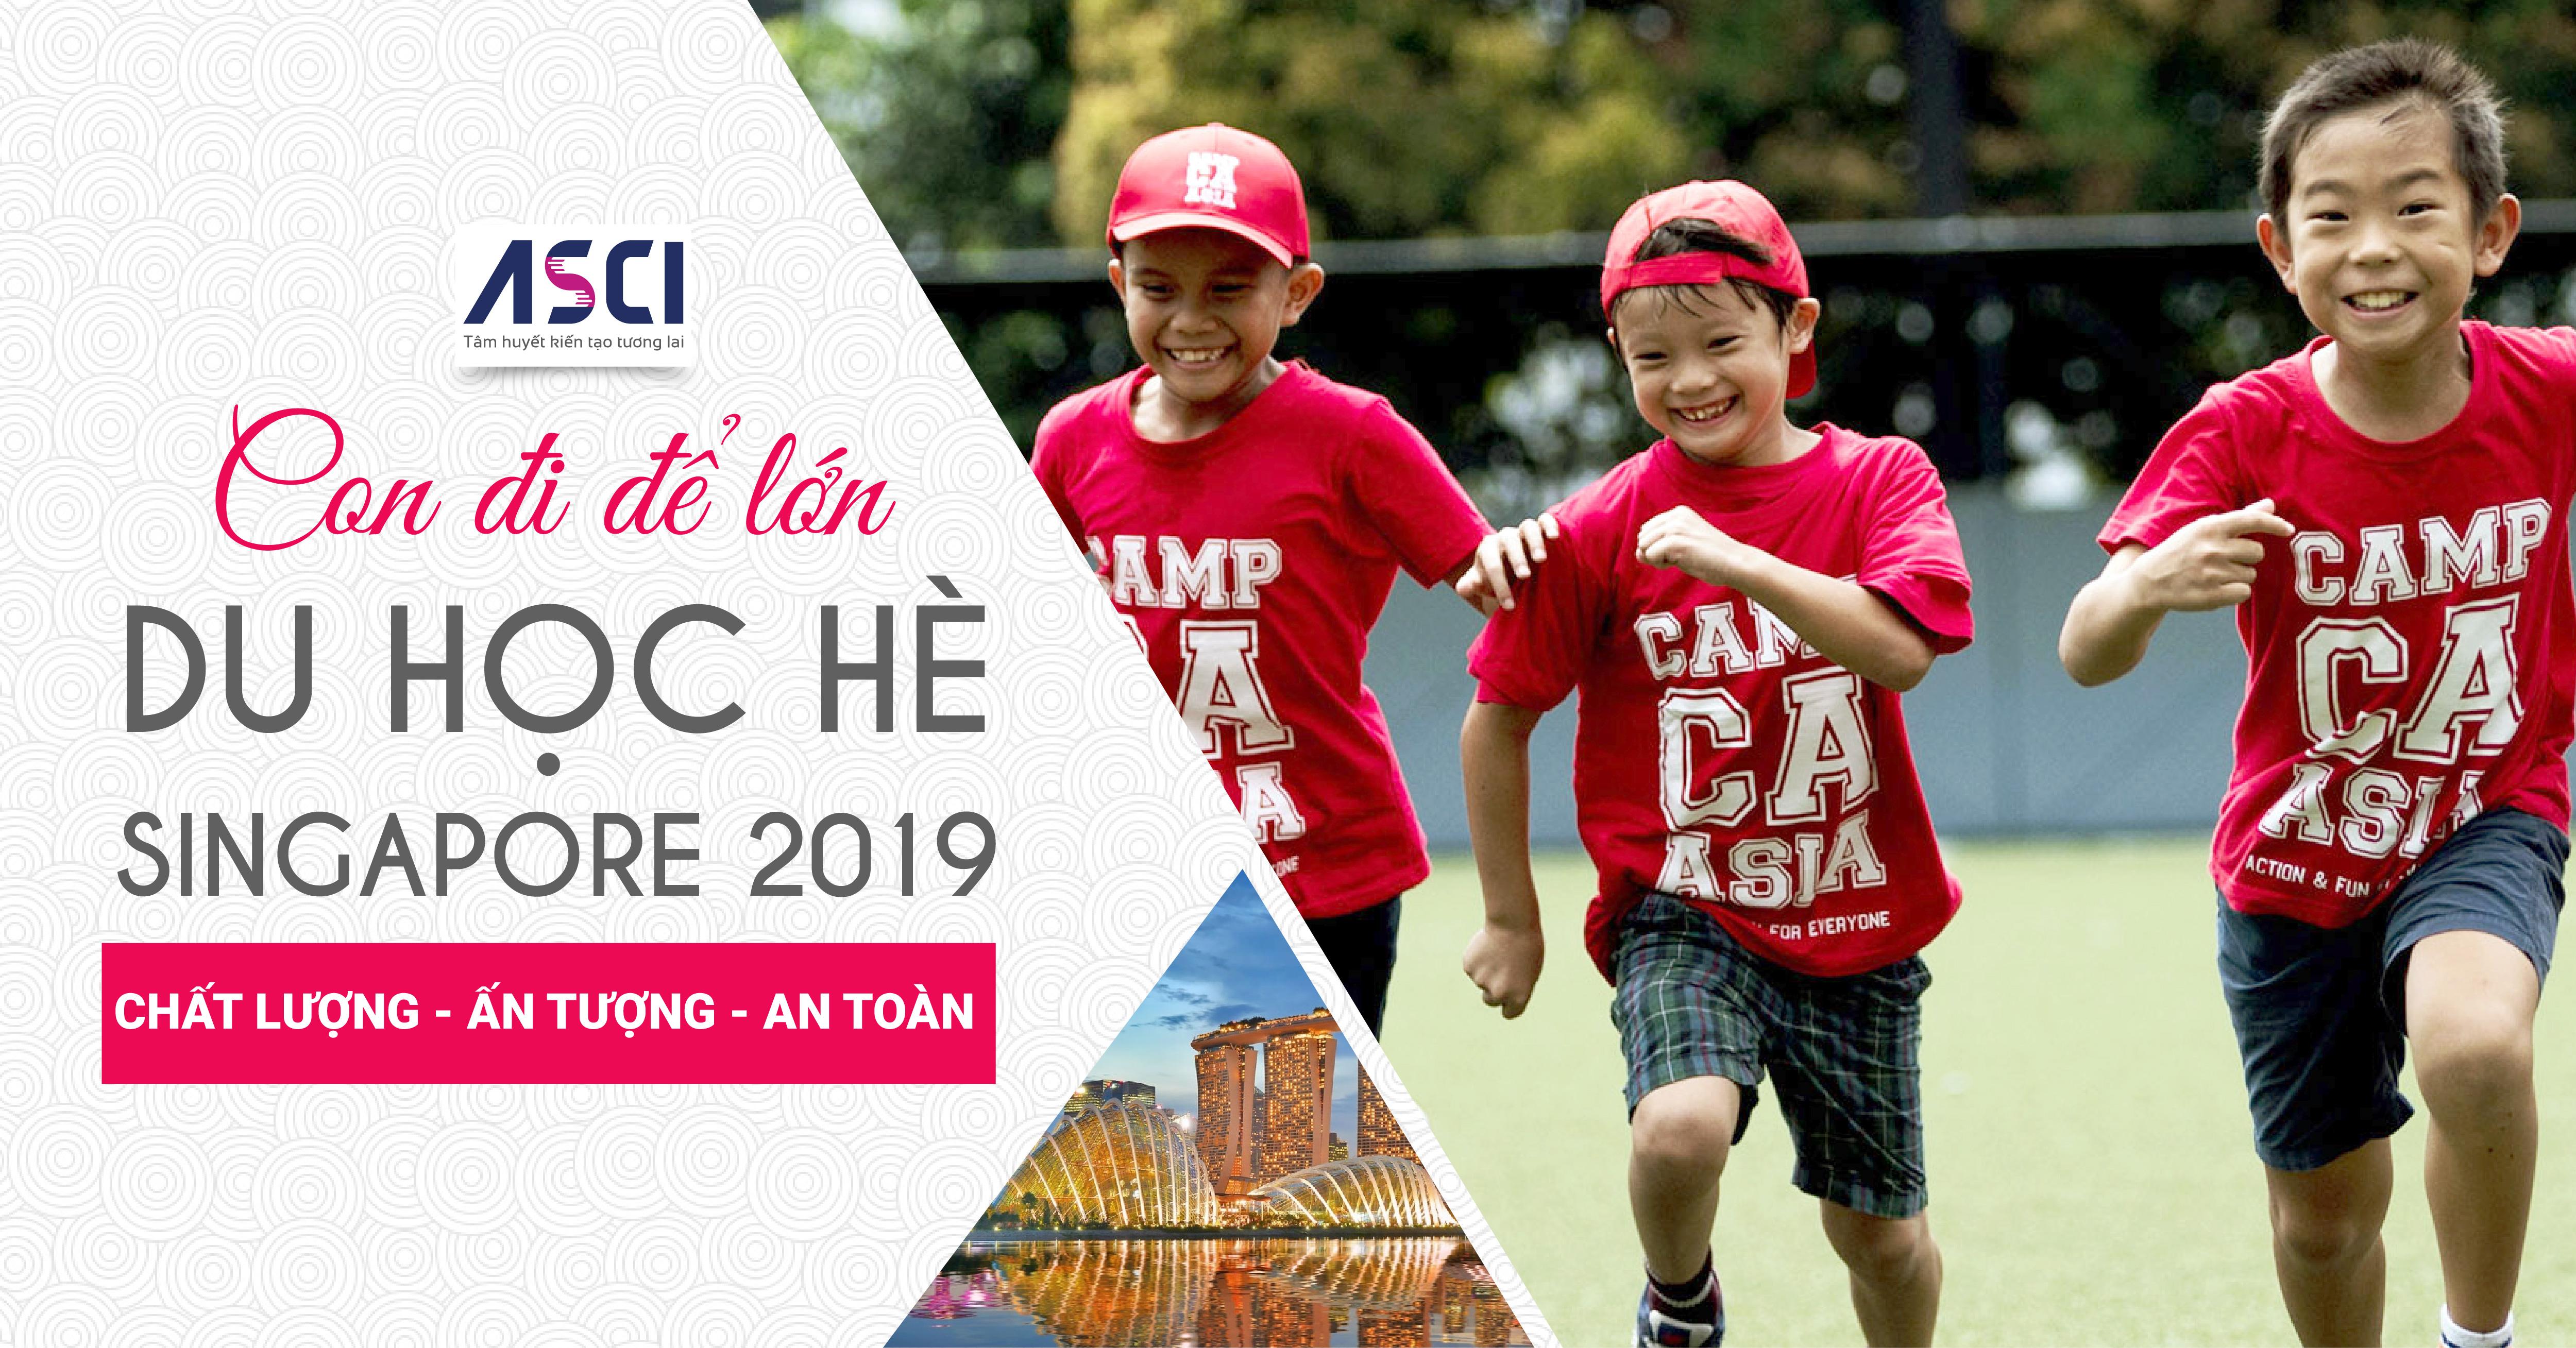 du-hoc-he-singapore-2019